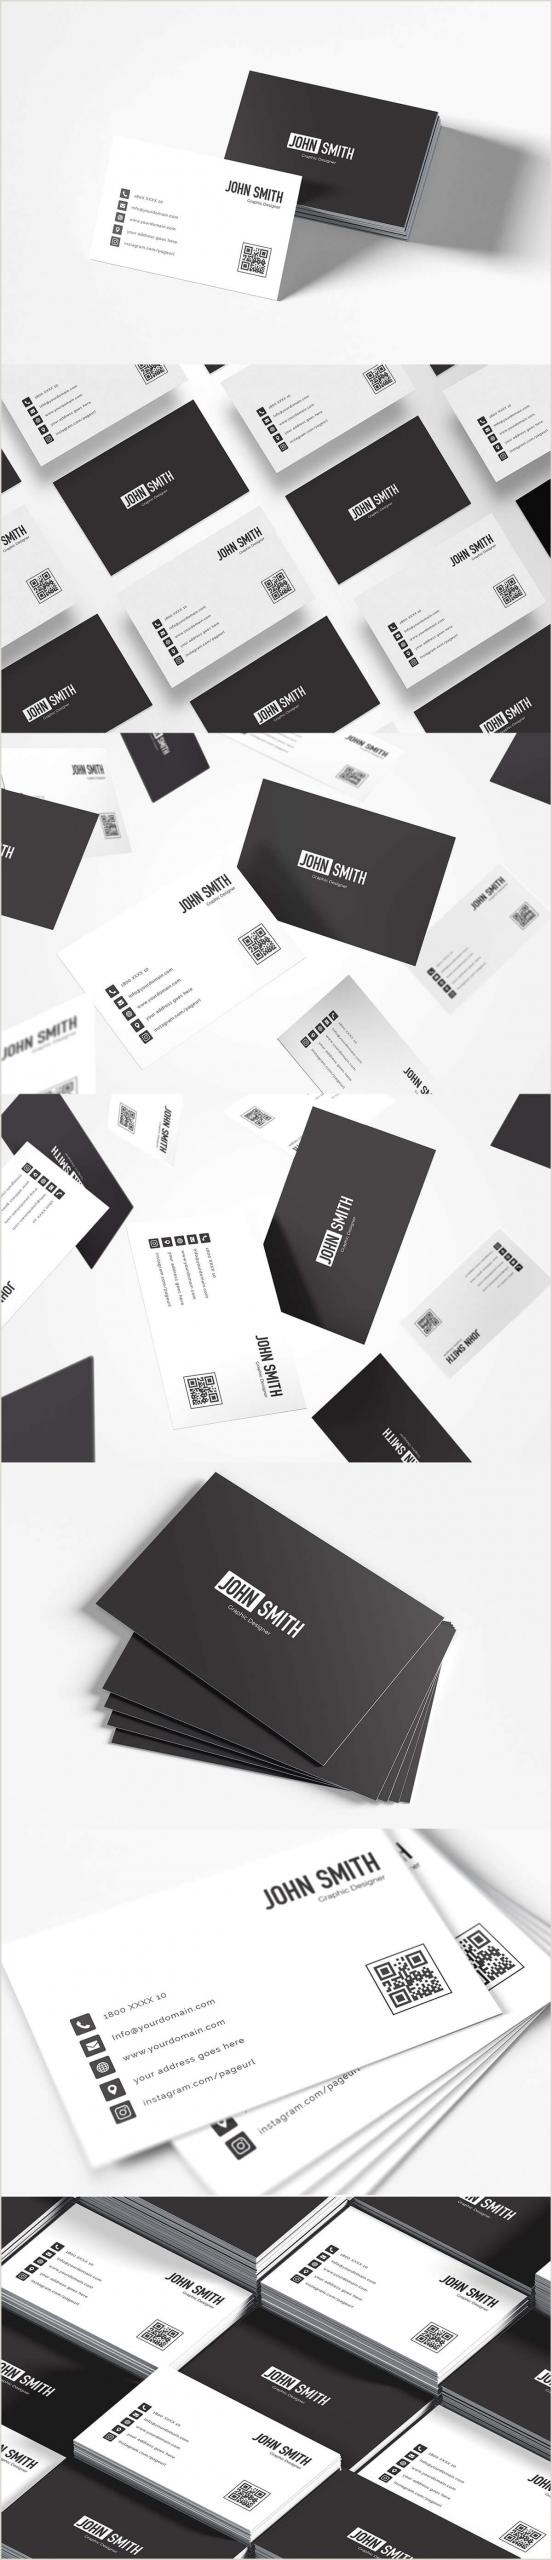 Basic Business Card Templates Free Simple Business Card Template Creativetacos